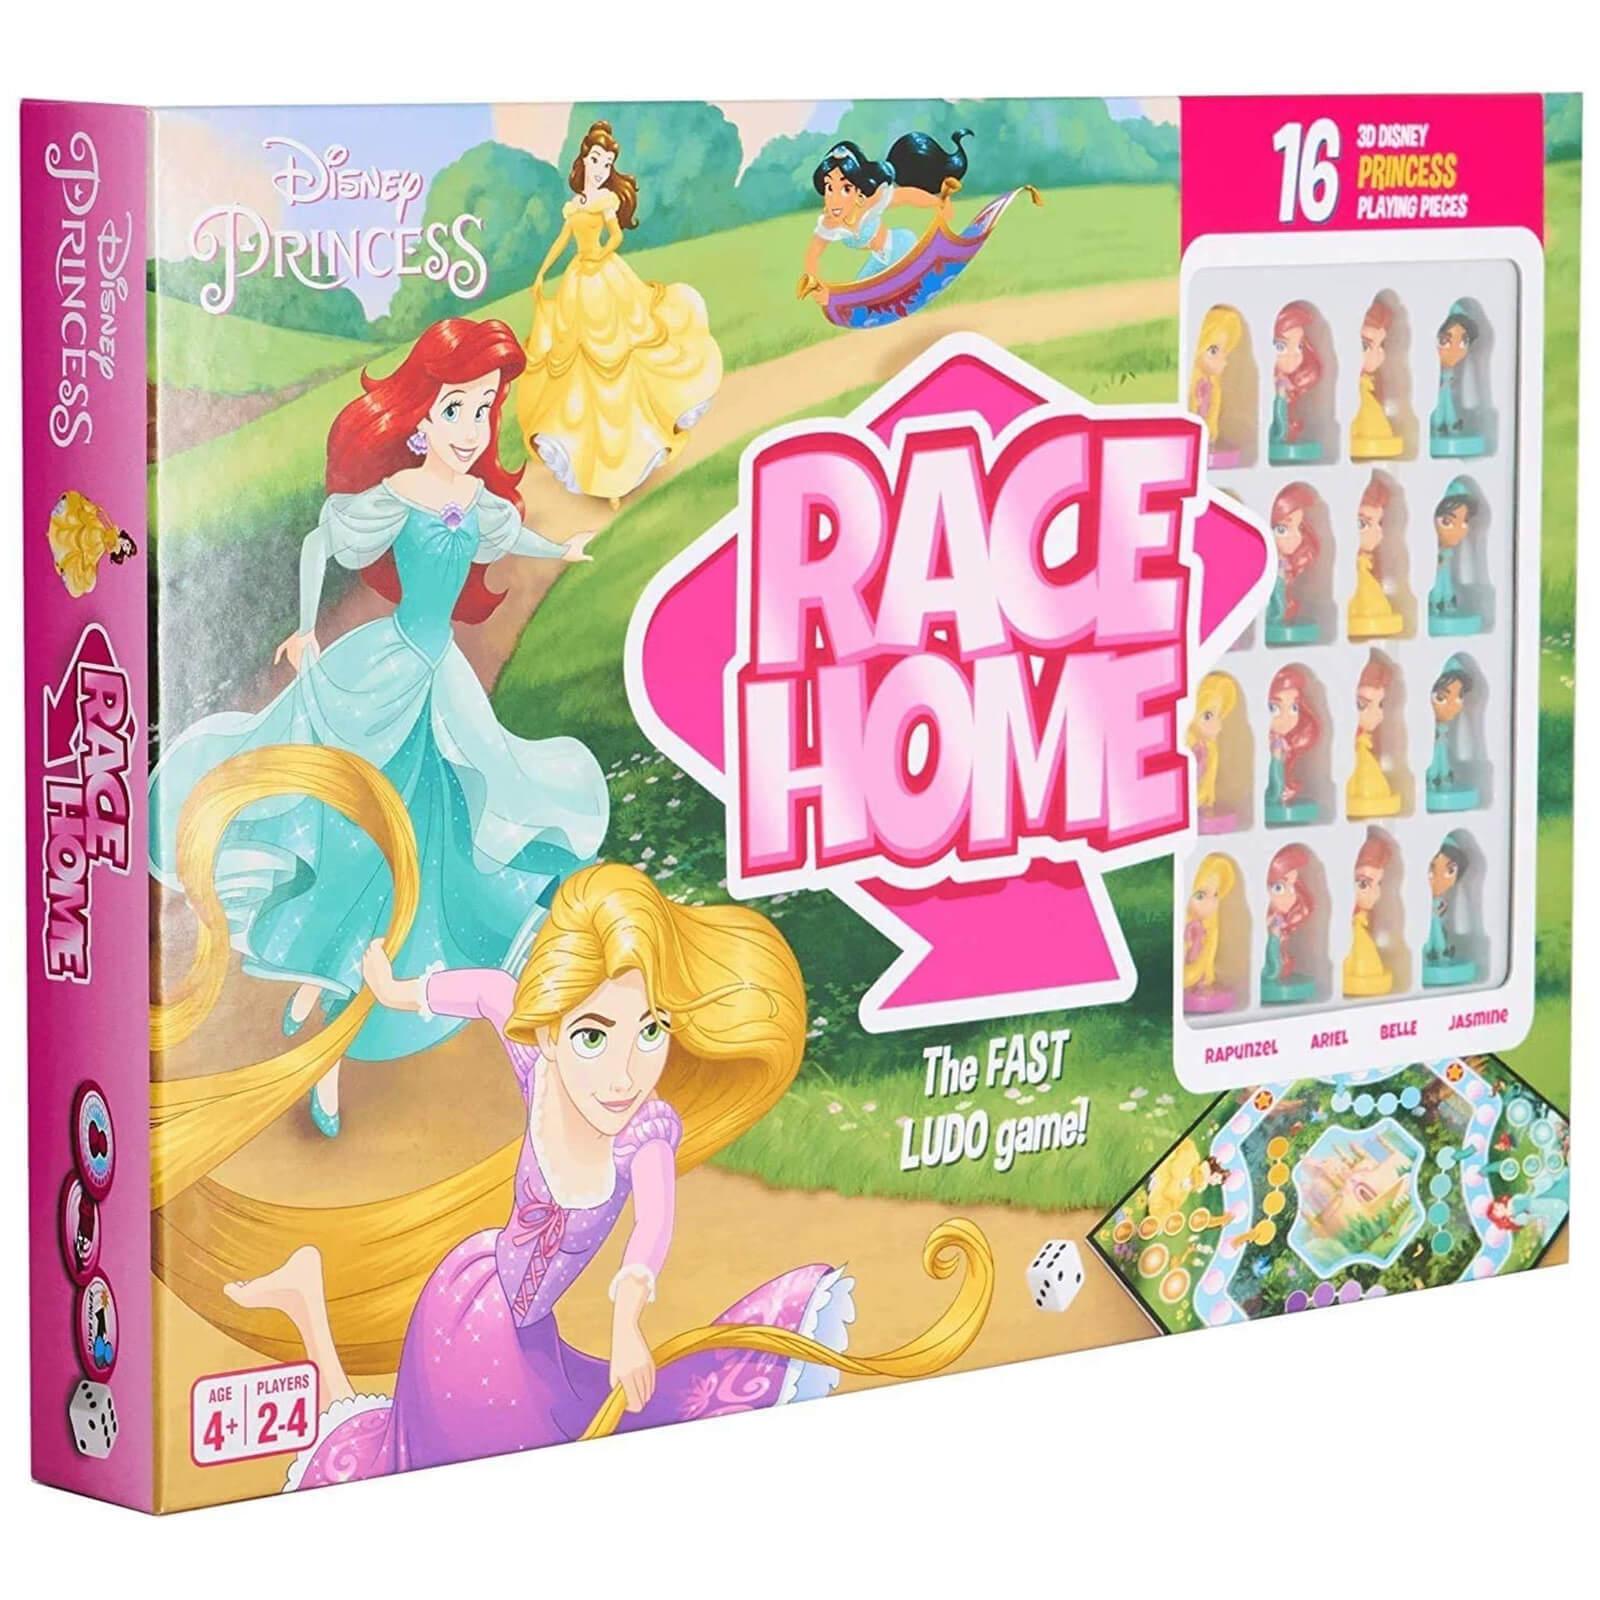 Image of Disney Princess Race Home Board Game